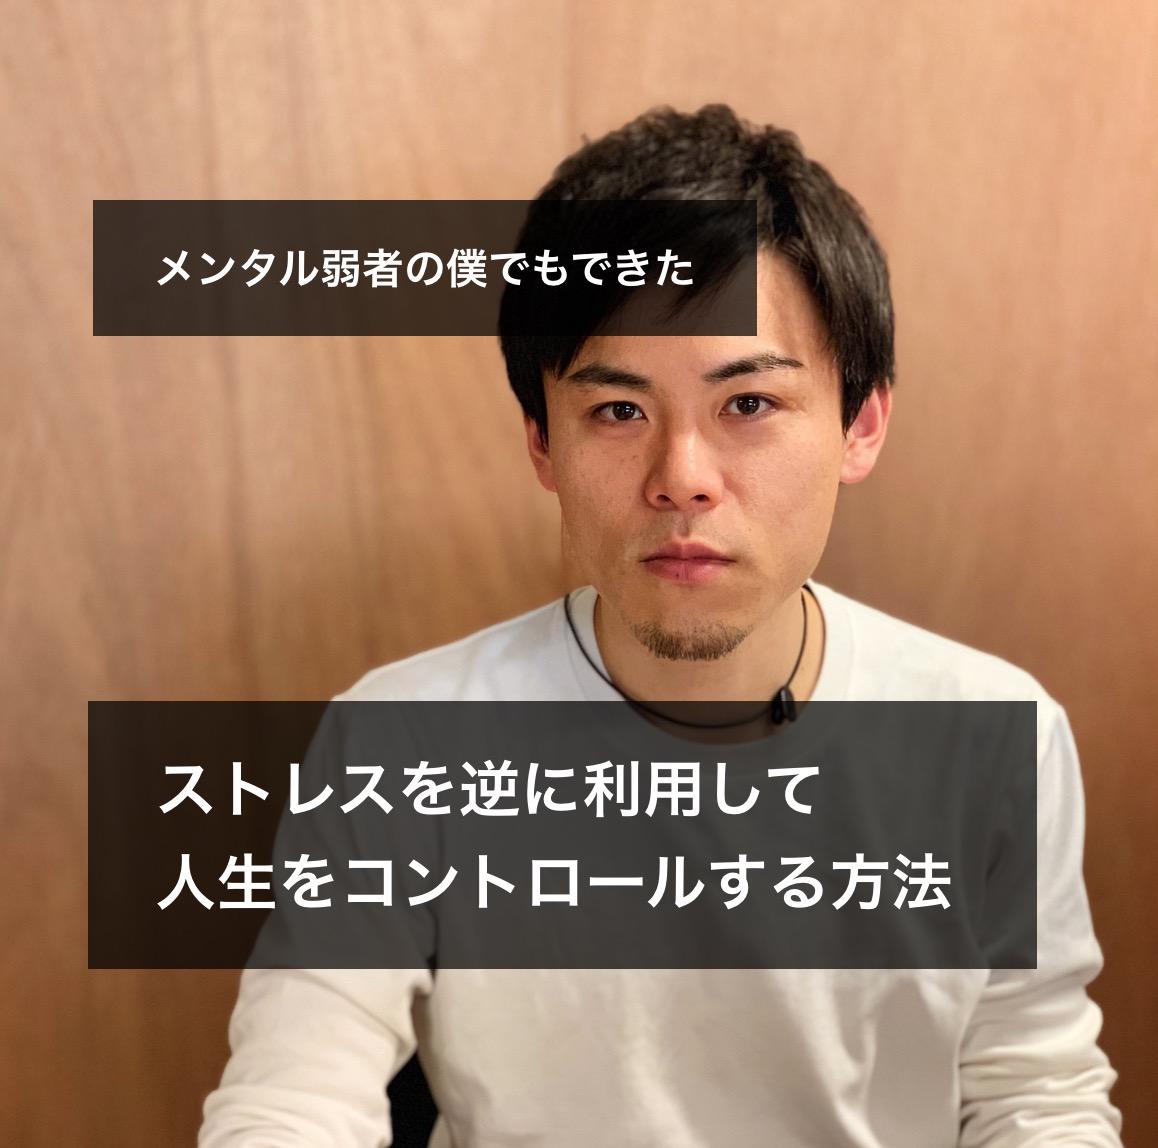 f:id:nabeshima-han:20190405120905j:plain